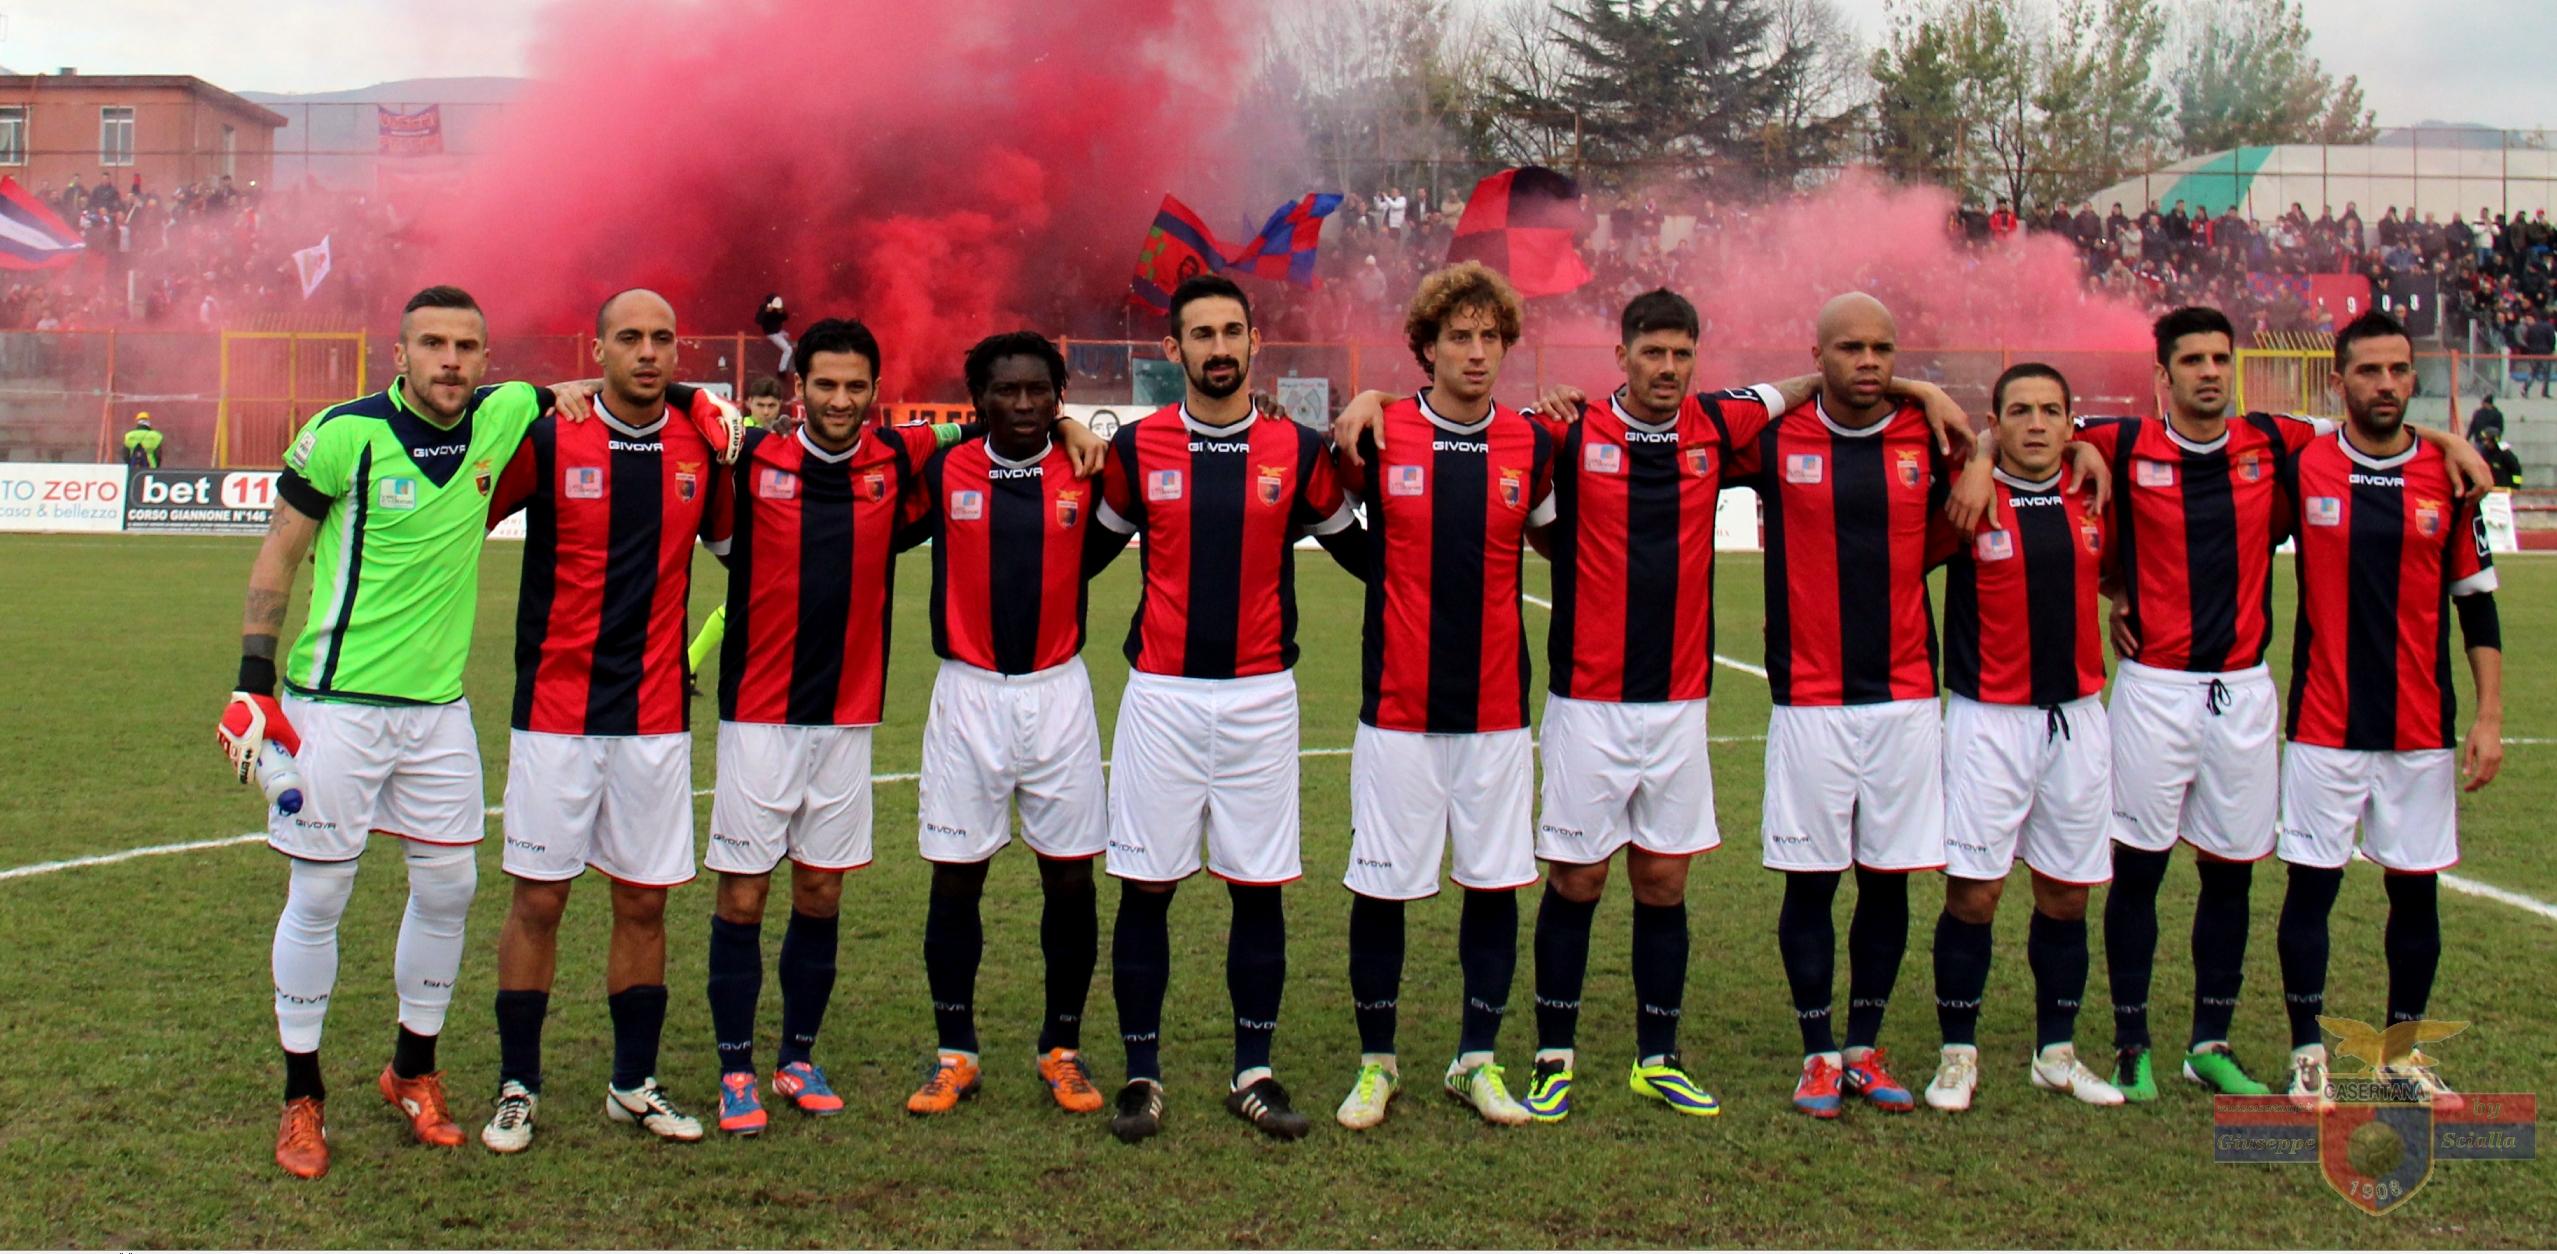 Casertana Football Club - Wikiwand